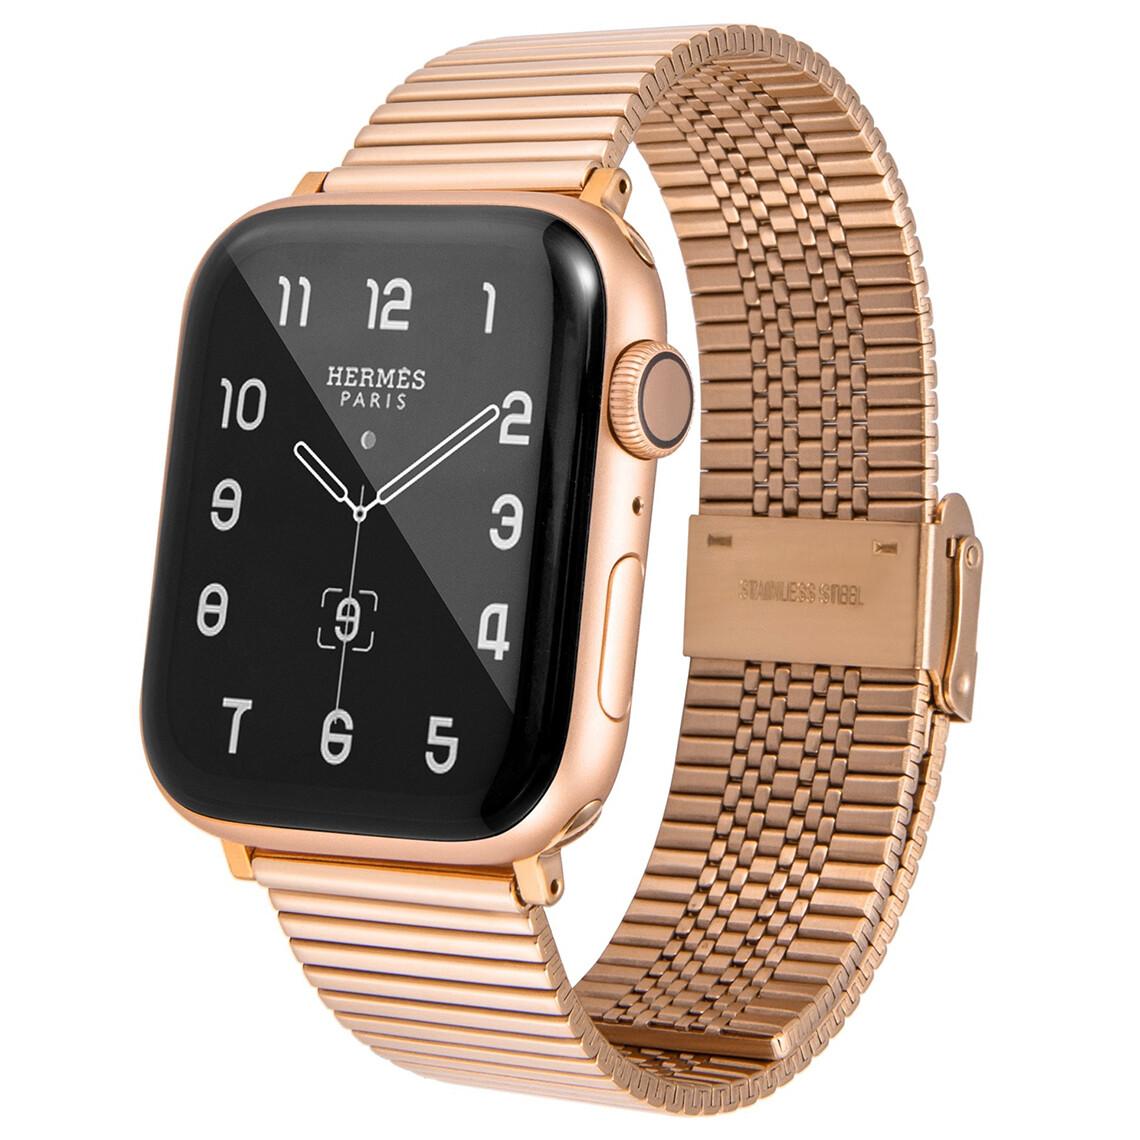 Premium Link Steel Strap for Apple Watch - Rose